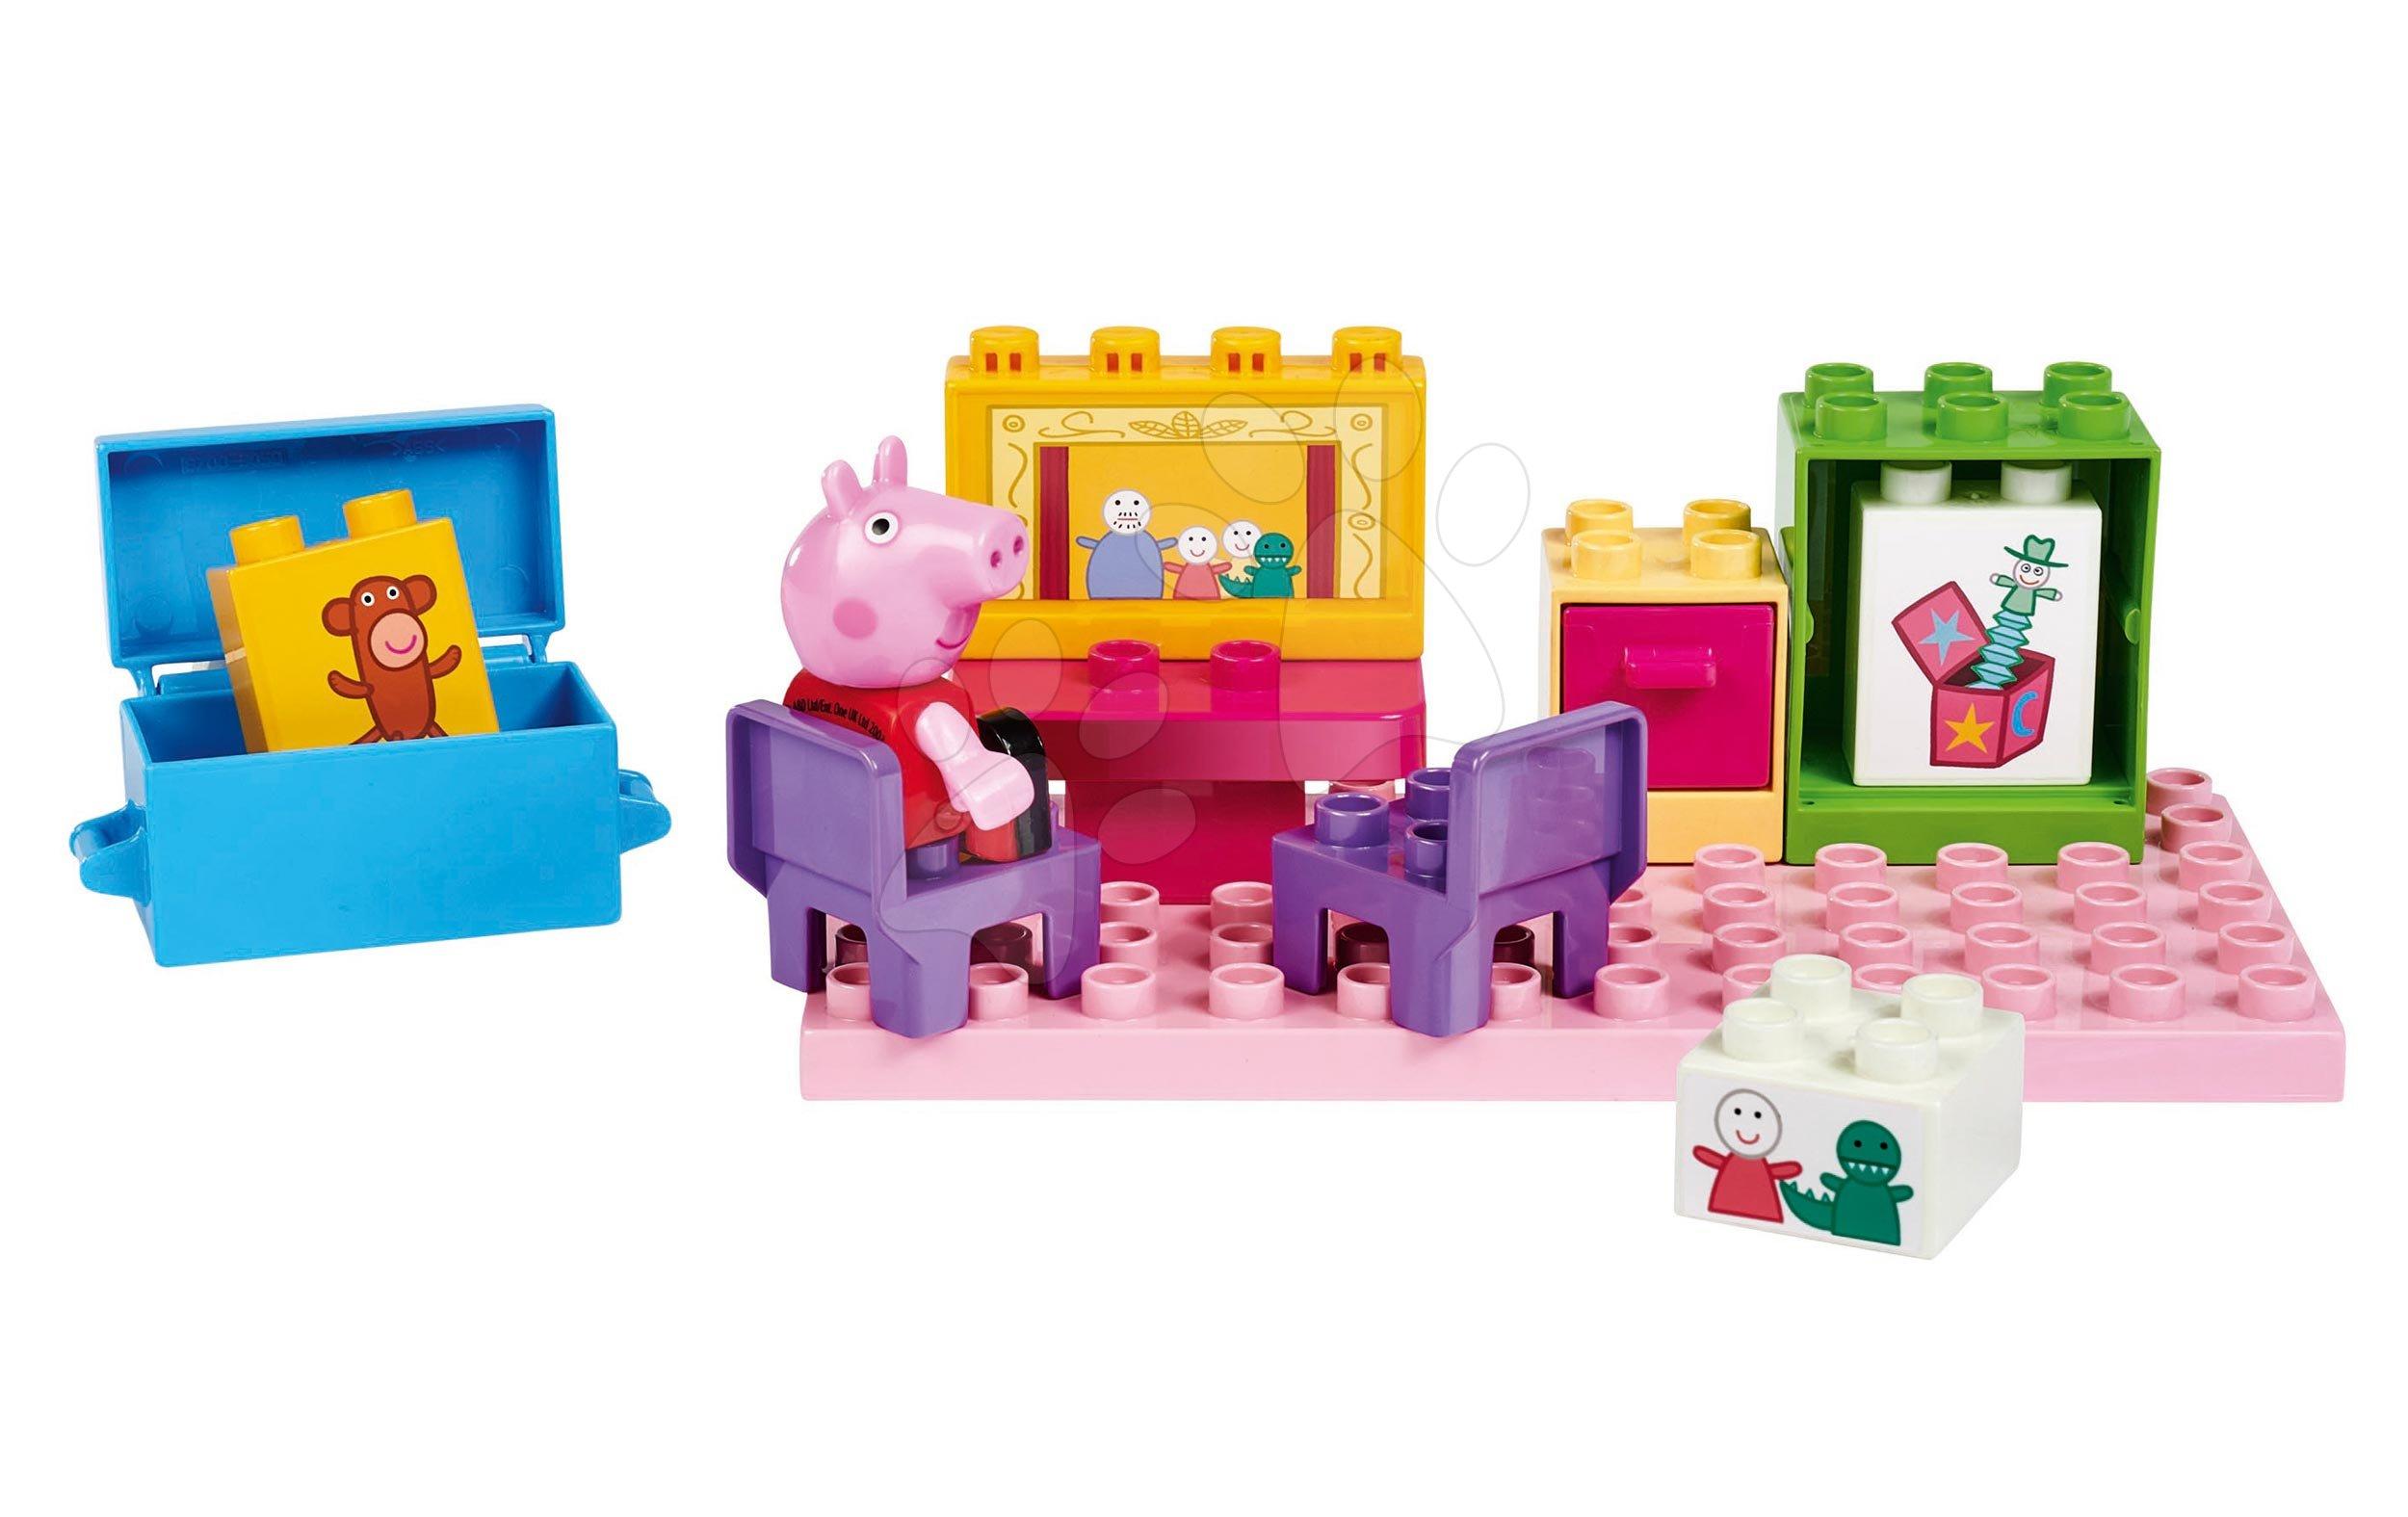 Stavebnica Peppa Pig Basic Sets II. PlayBIG Bloxx s figúrkou v izbe od 18 mes